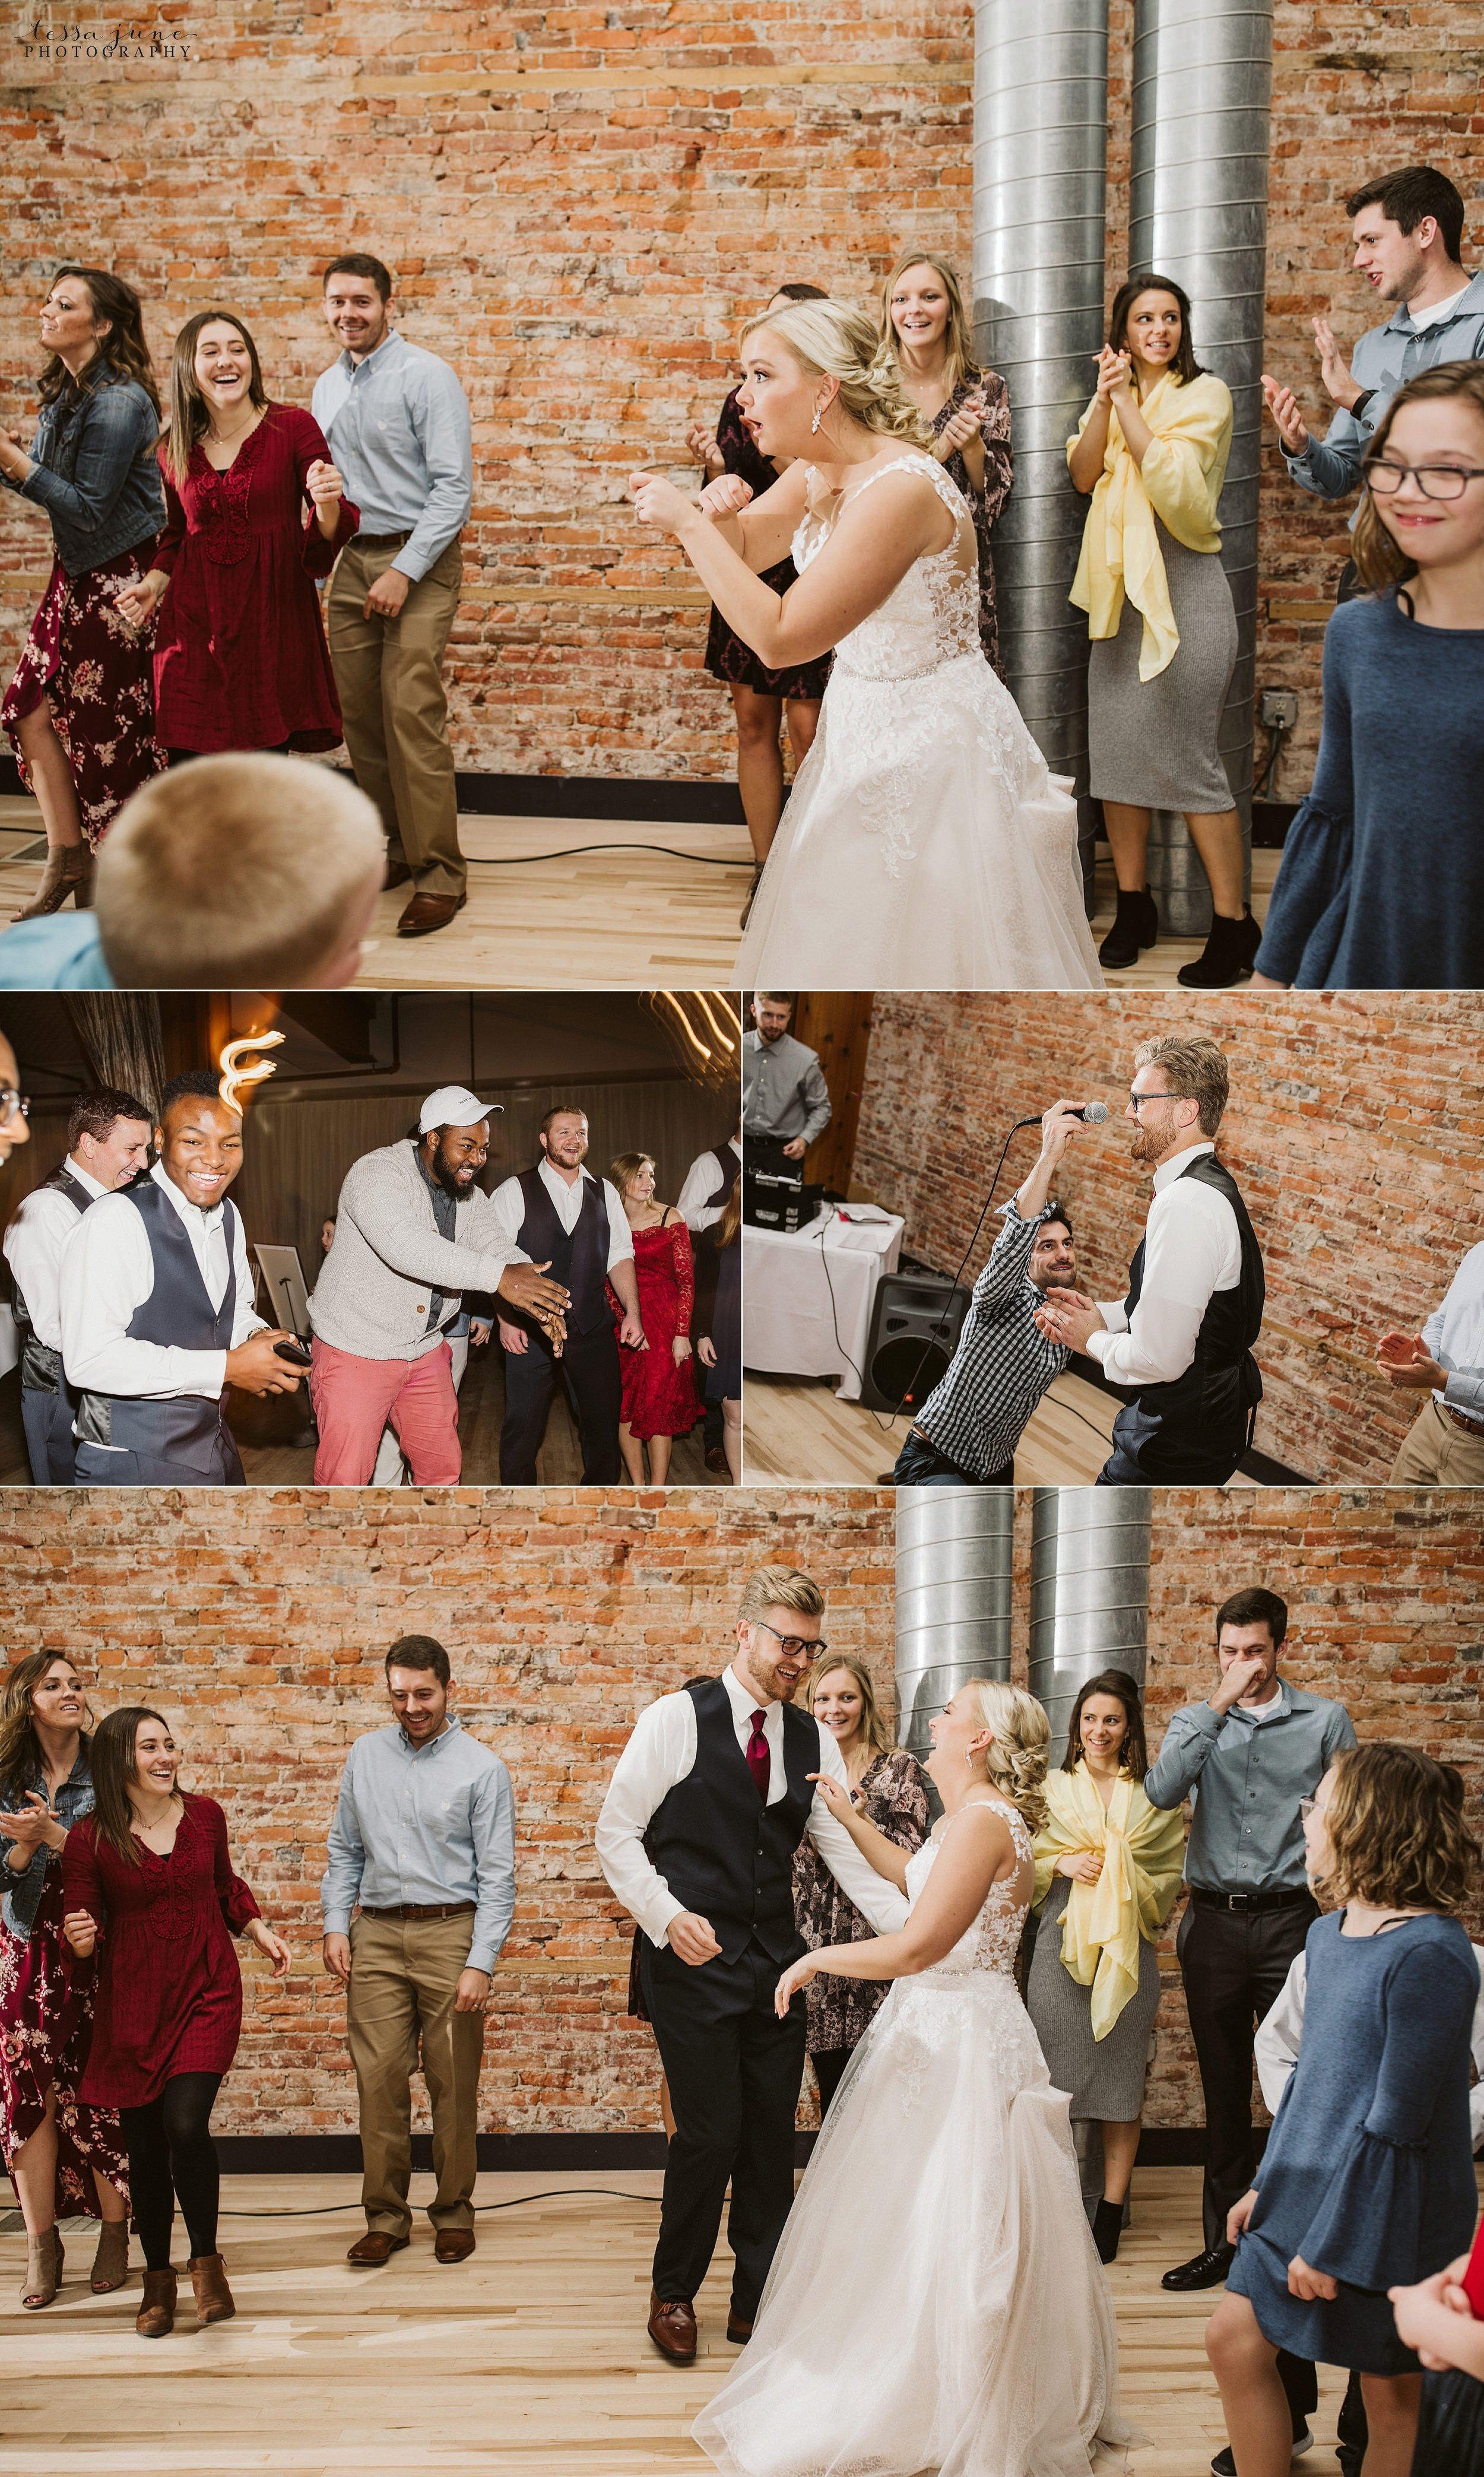 the-3-ten-event-venue-november-elegant-cozy-wedding-faribault-minnesota-155.jpg